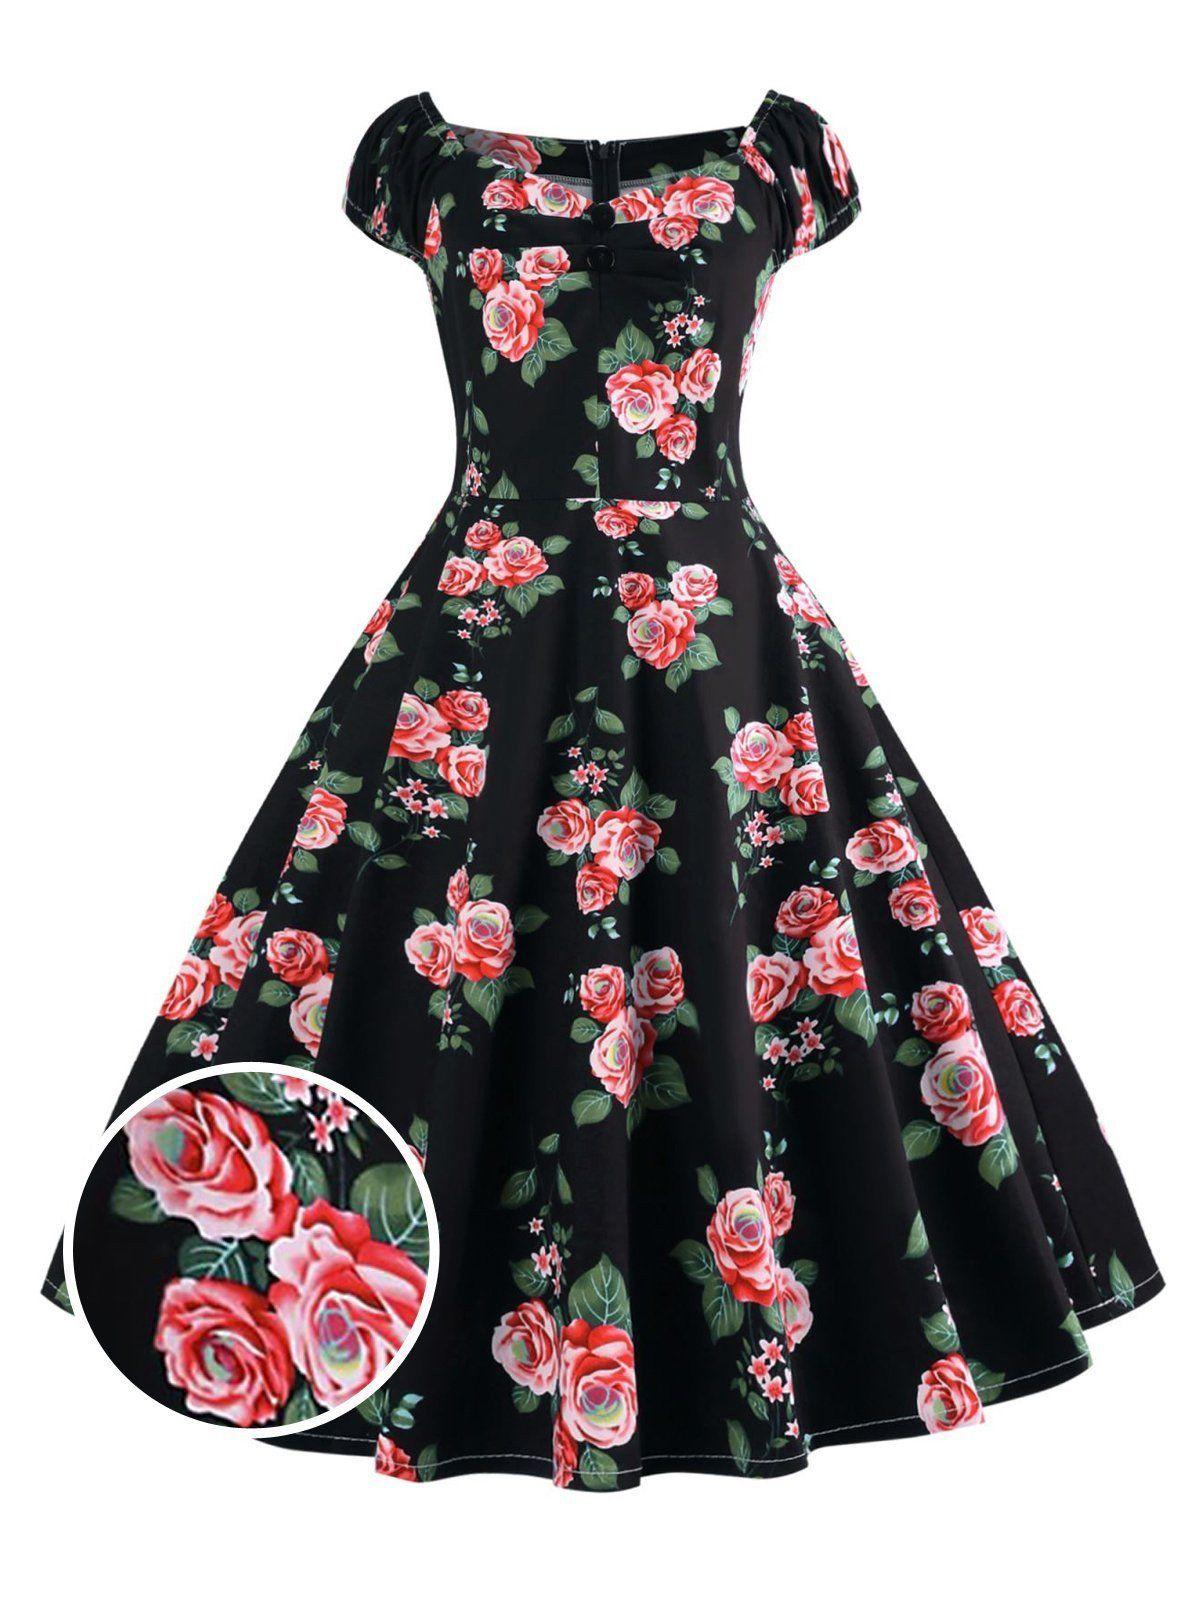 1950s Inspired Rose Swing Dress Plus Size Vintage Dresses Vintage Red Dress Vintage Dresses [ 1600 x 1200 Pixel ]